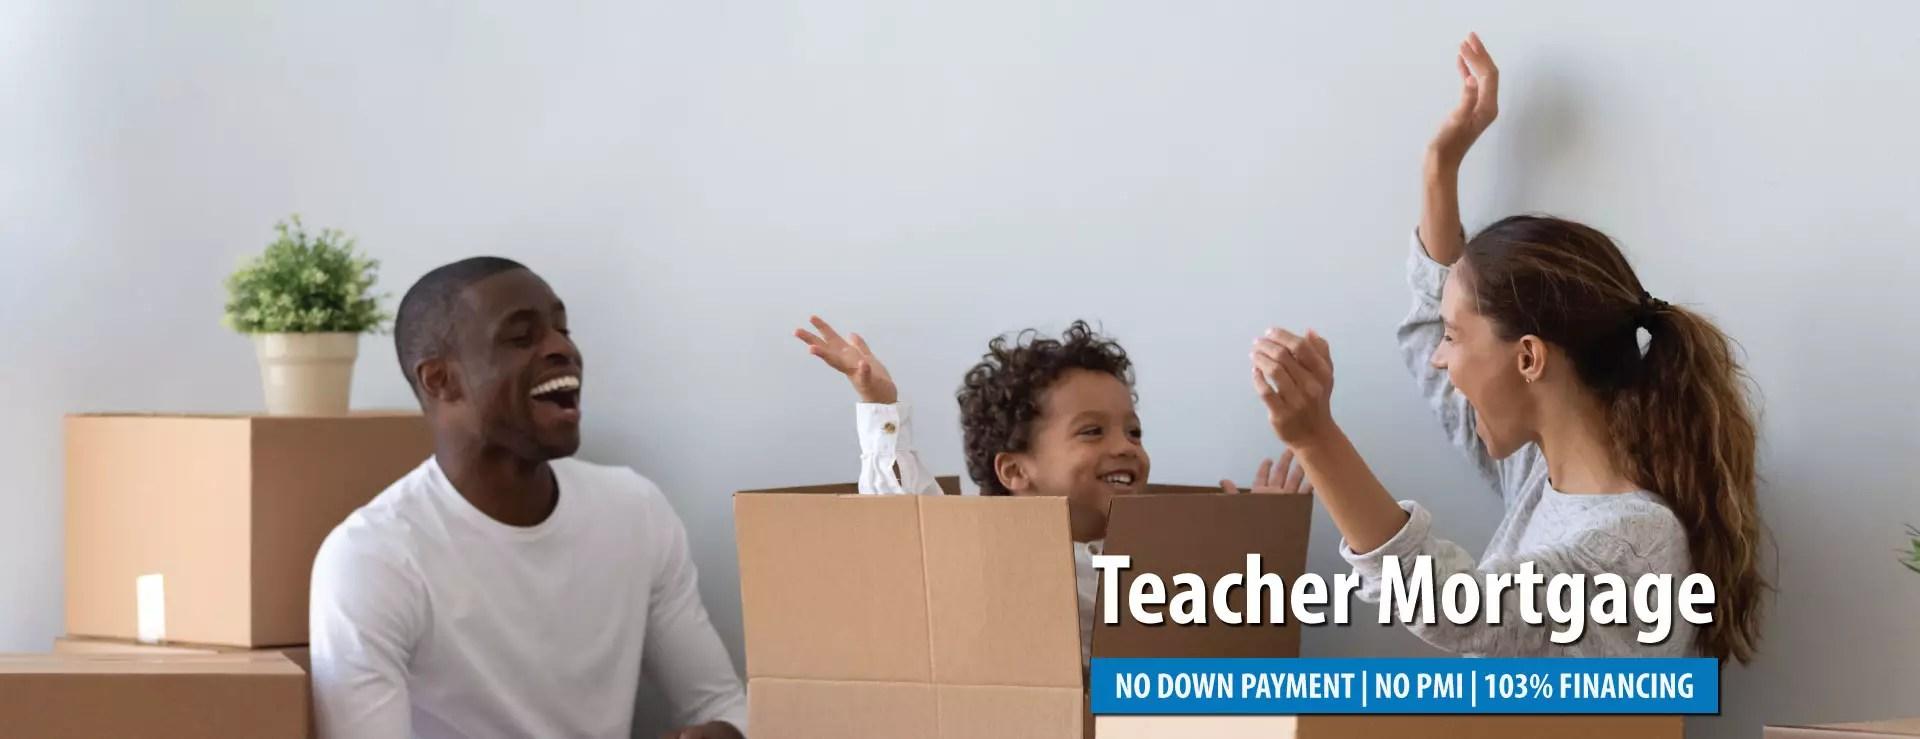 teacher-mortgage-web-banner-july-v2-2